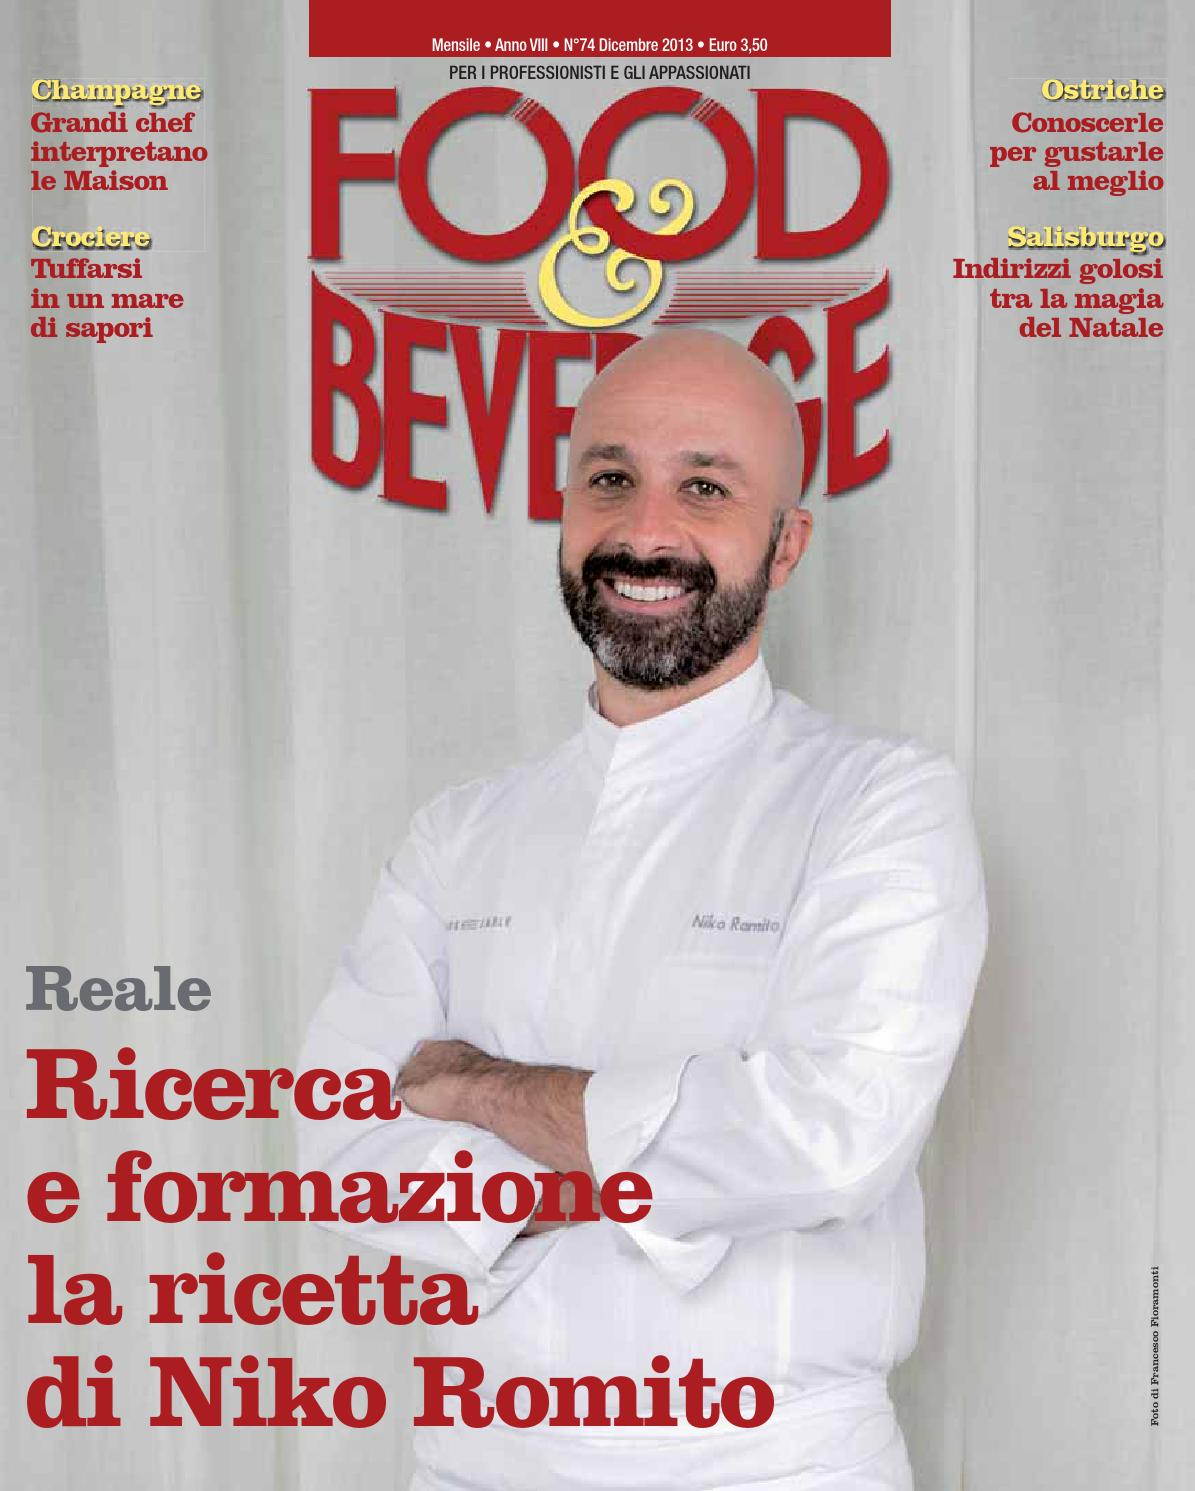 F b74 x sito by FOOD BEVERAGE - issuu 0e4c60bf475